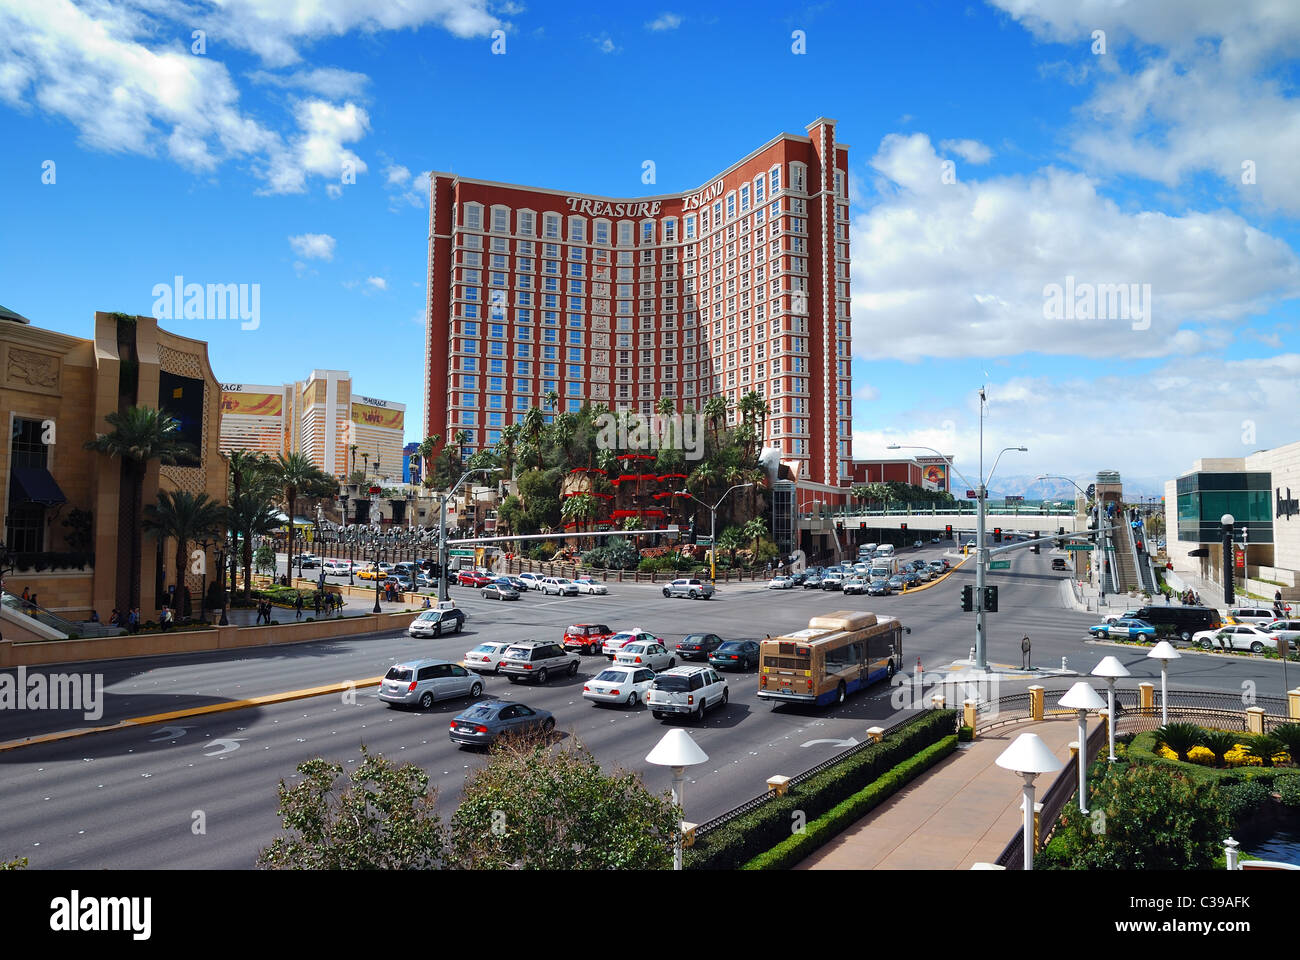 My Treasure Island Las Vegas